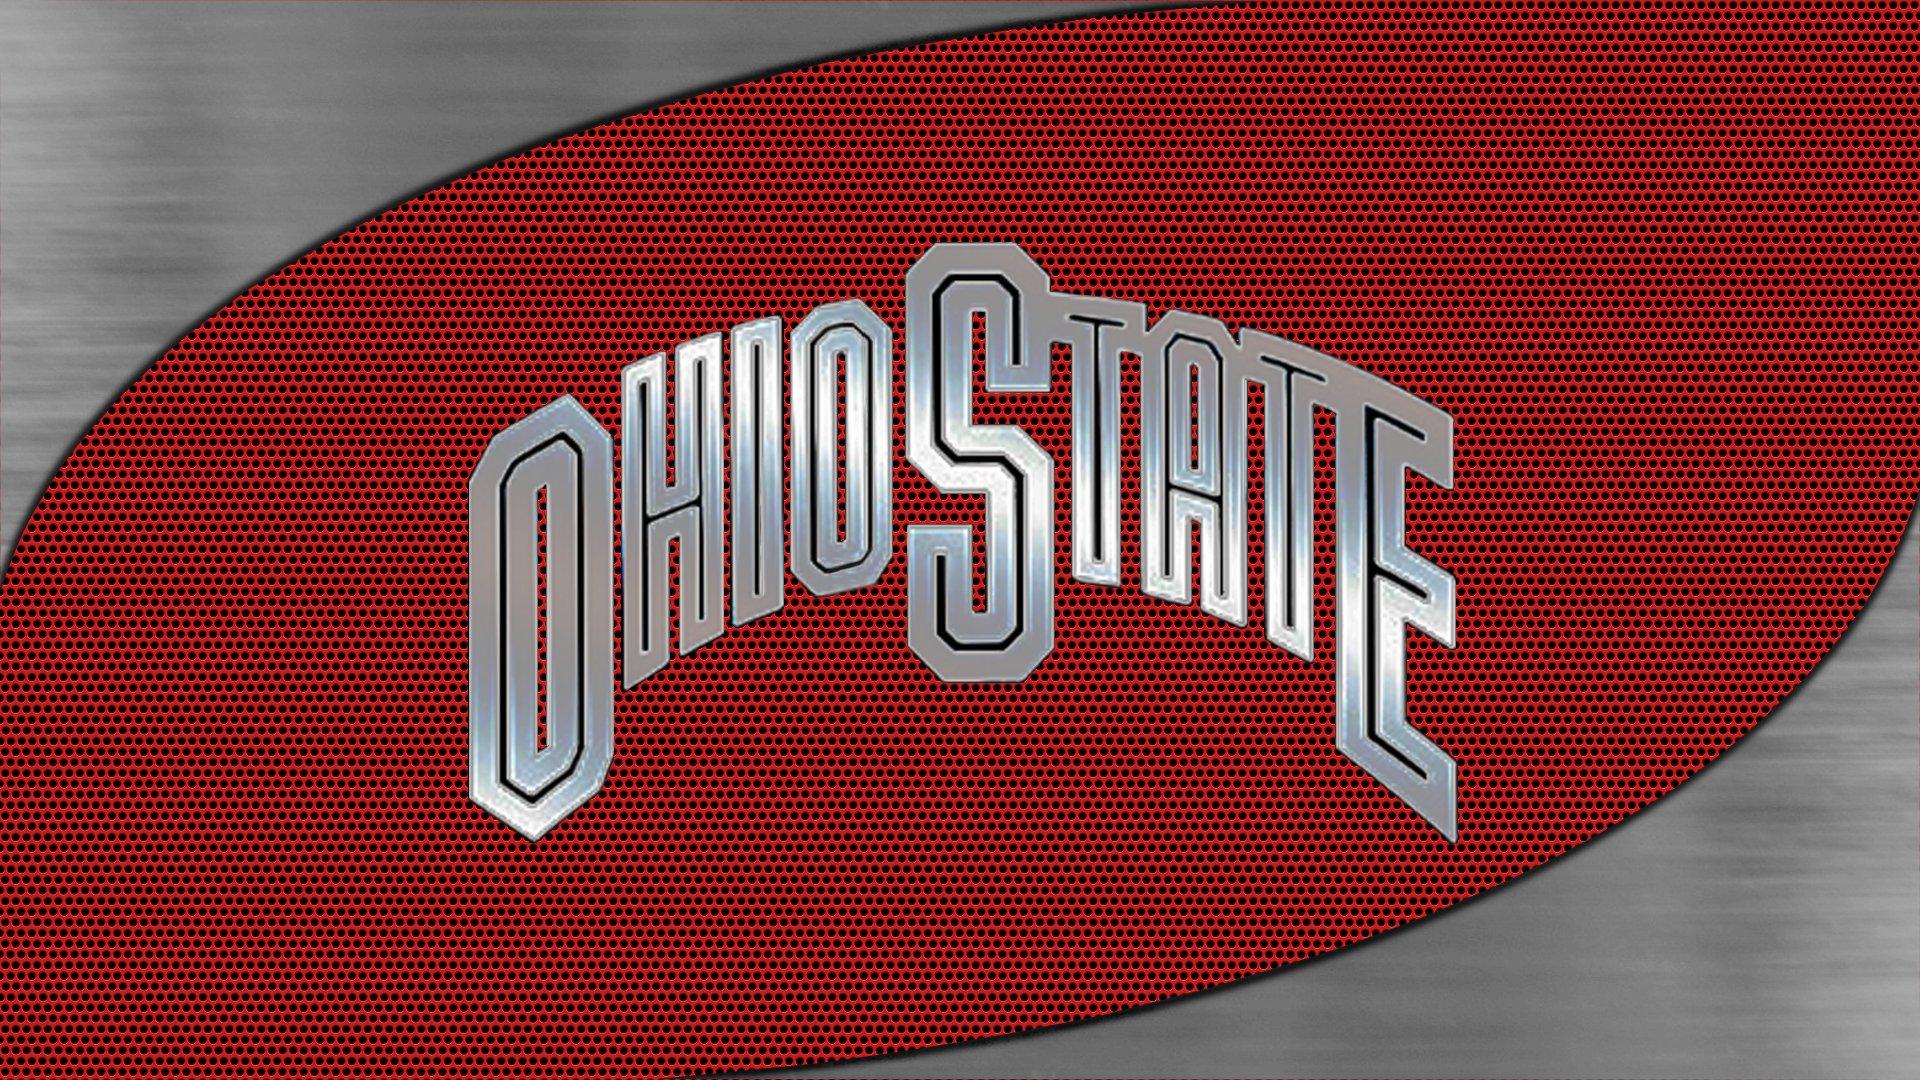 OSU Wallpaper 236 - Ohio State Football Wallpaper ...